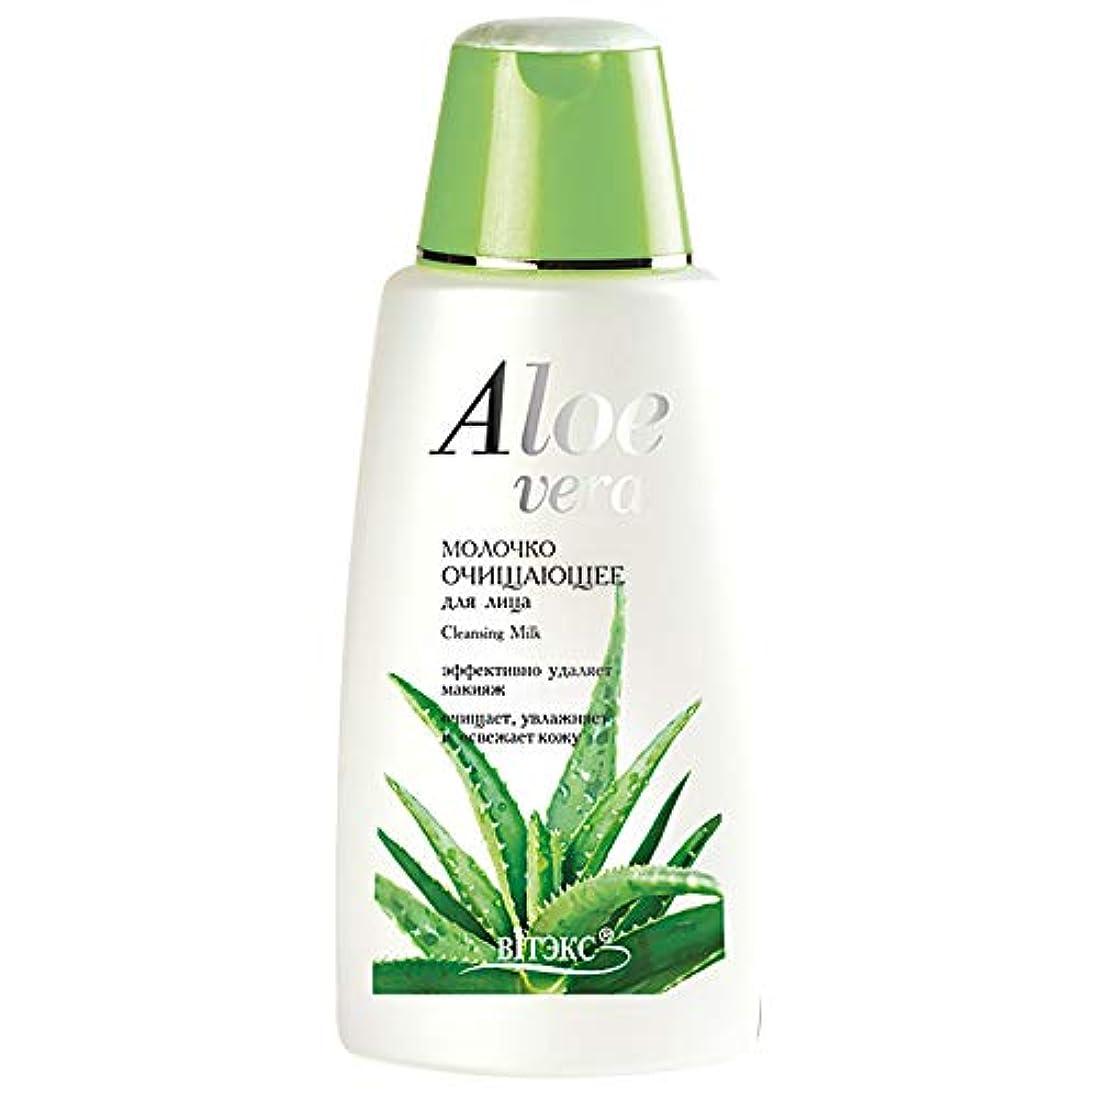 BIELITA & VITEX   Aloe Vera   Nourishing Face Cleansing Make Up   Remover Cleansing Milk for All Skin Types  ...